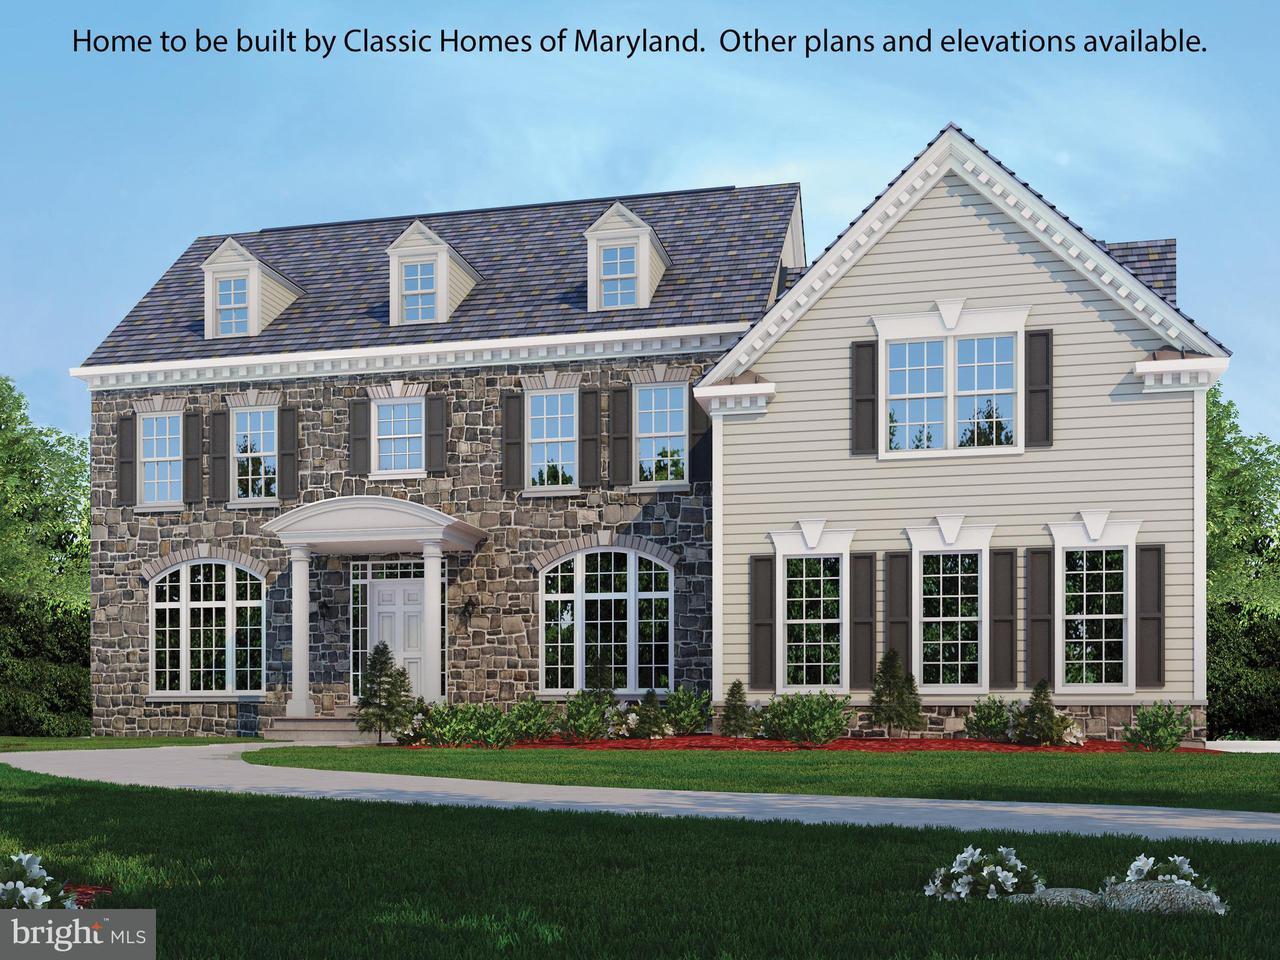 Single Family Home for Sale at 9100 Rouen Lane 9100 Rouen Lane Potomac, Maryland 20854 United States